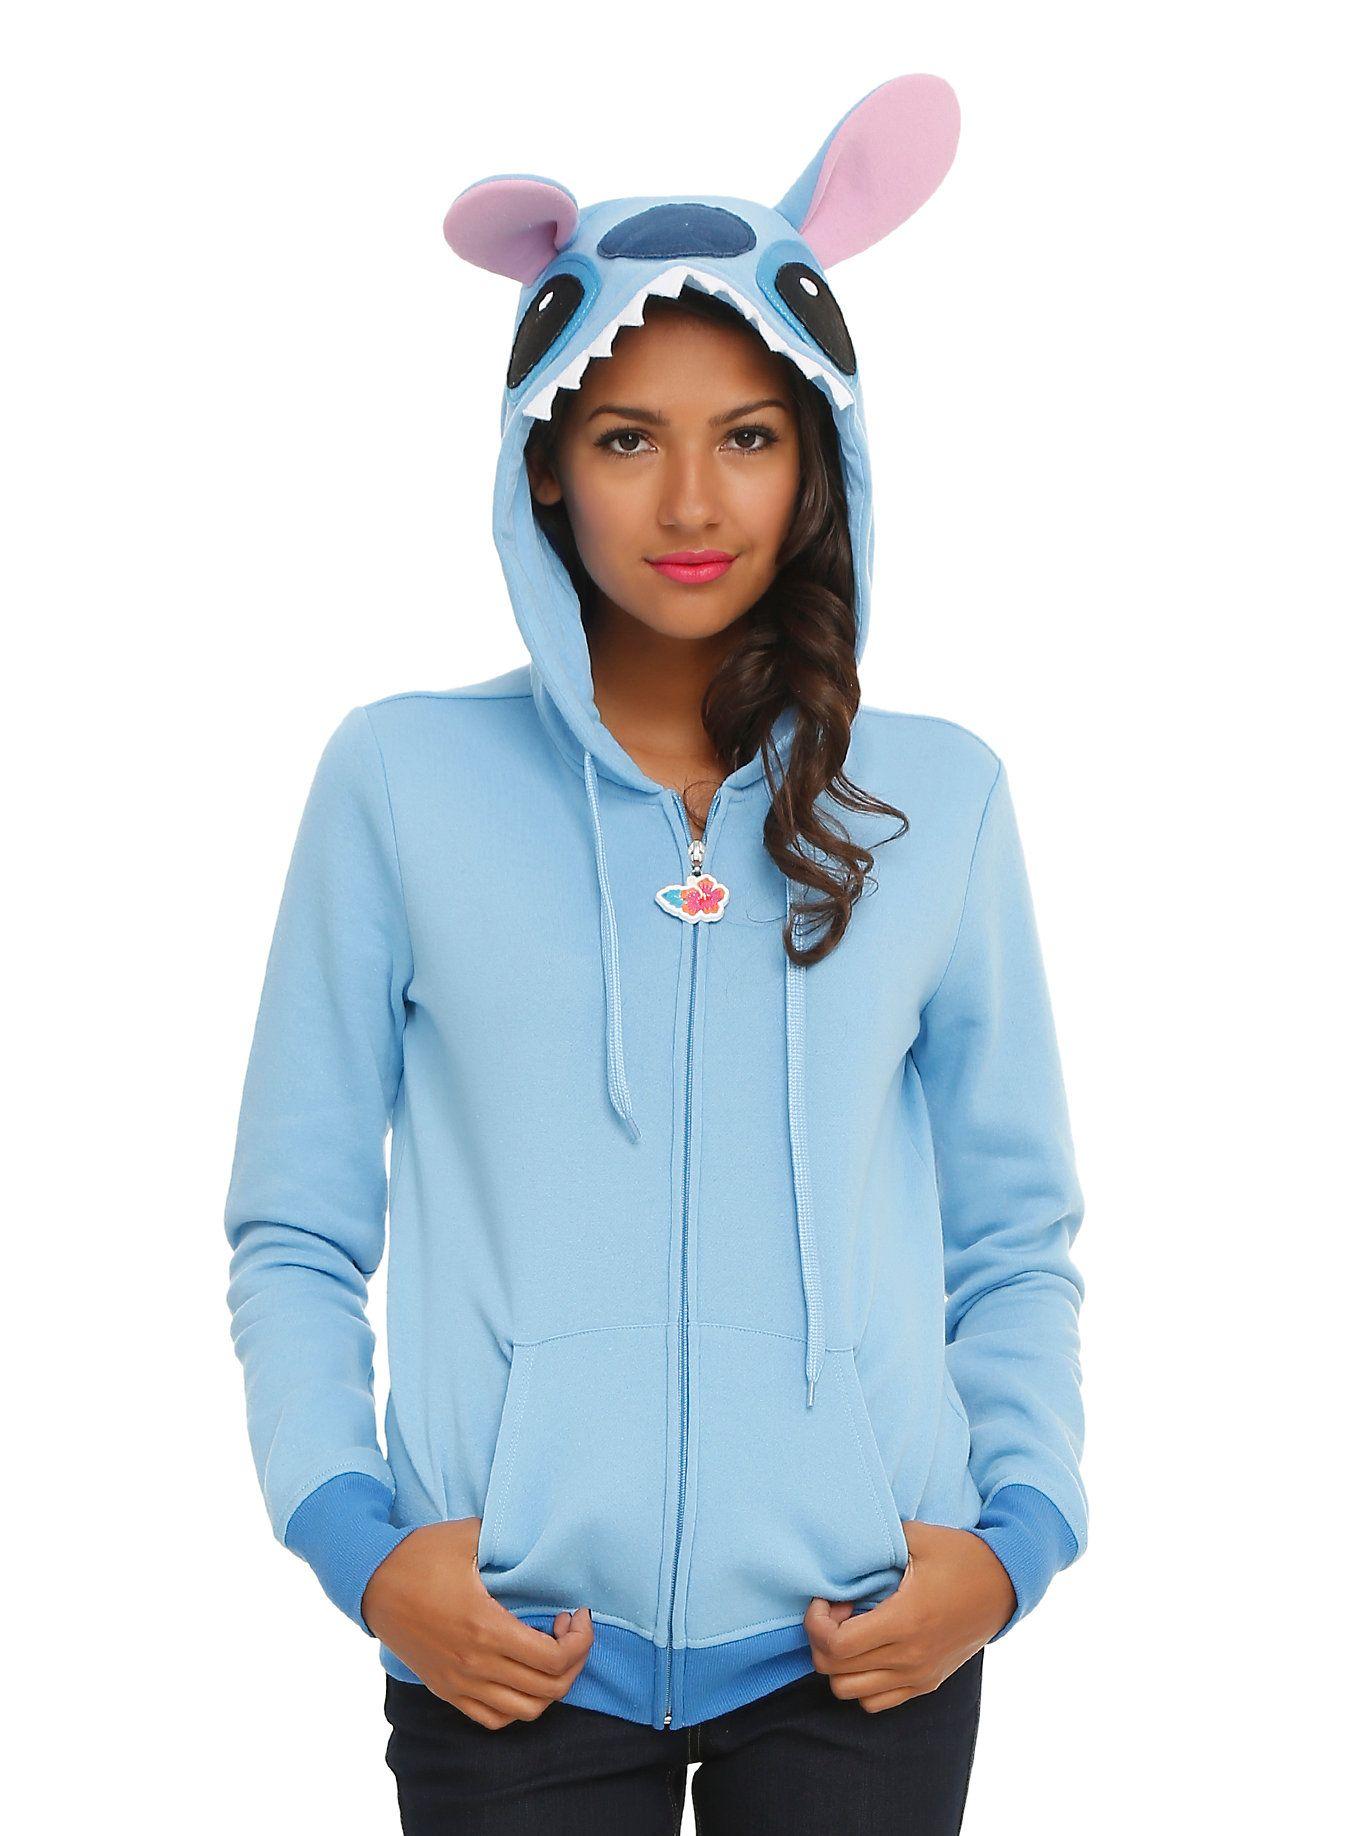 db3f4e34f32d Zip hoodie from Disney's <i>Lilo & Stitch</i> with a fiercely adorable  Stitch cosplay design.<ul><li> 60% cotton; 40% polyester</li><li>Wash cold;  ...